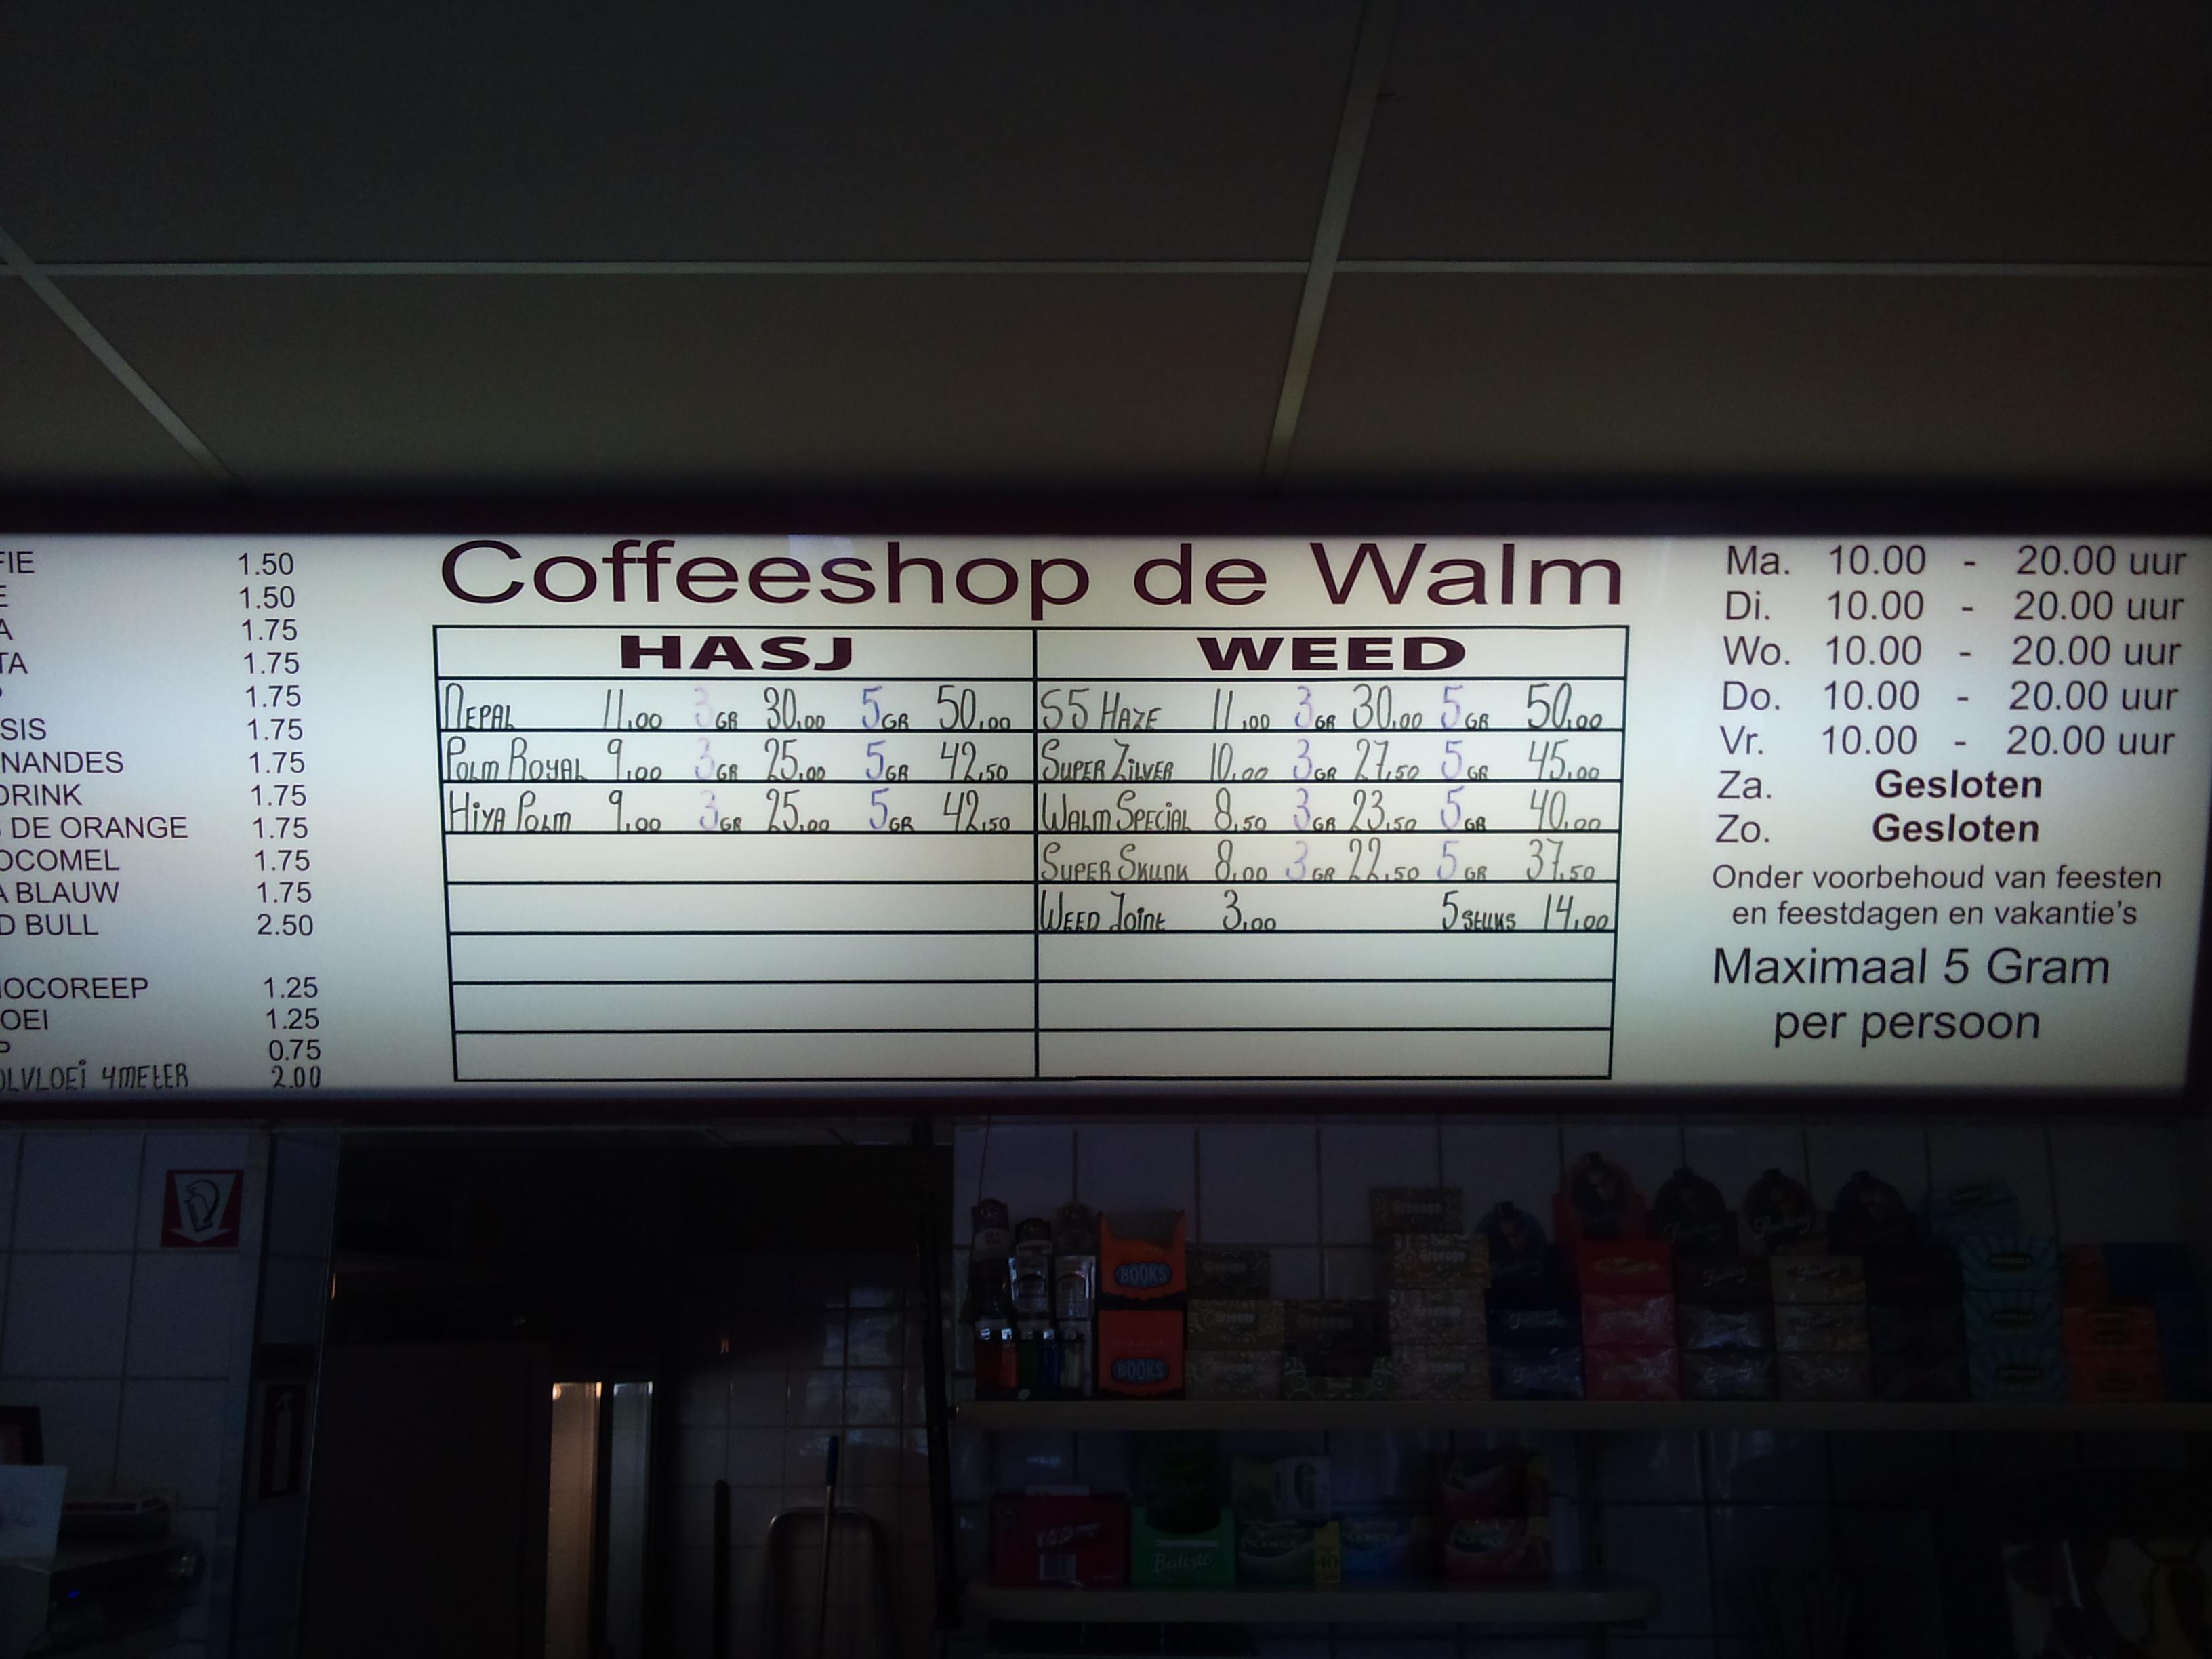 In venlo coffeeshop Amsterdam Coffeeshop